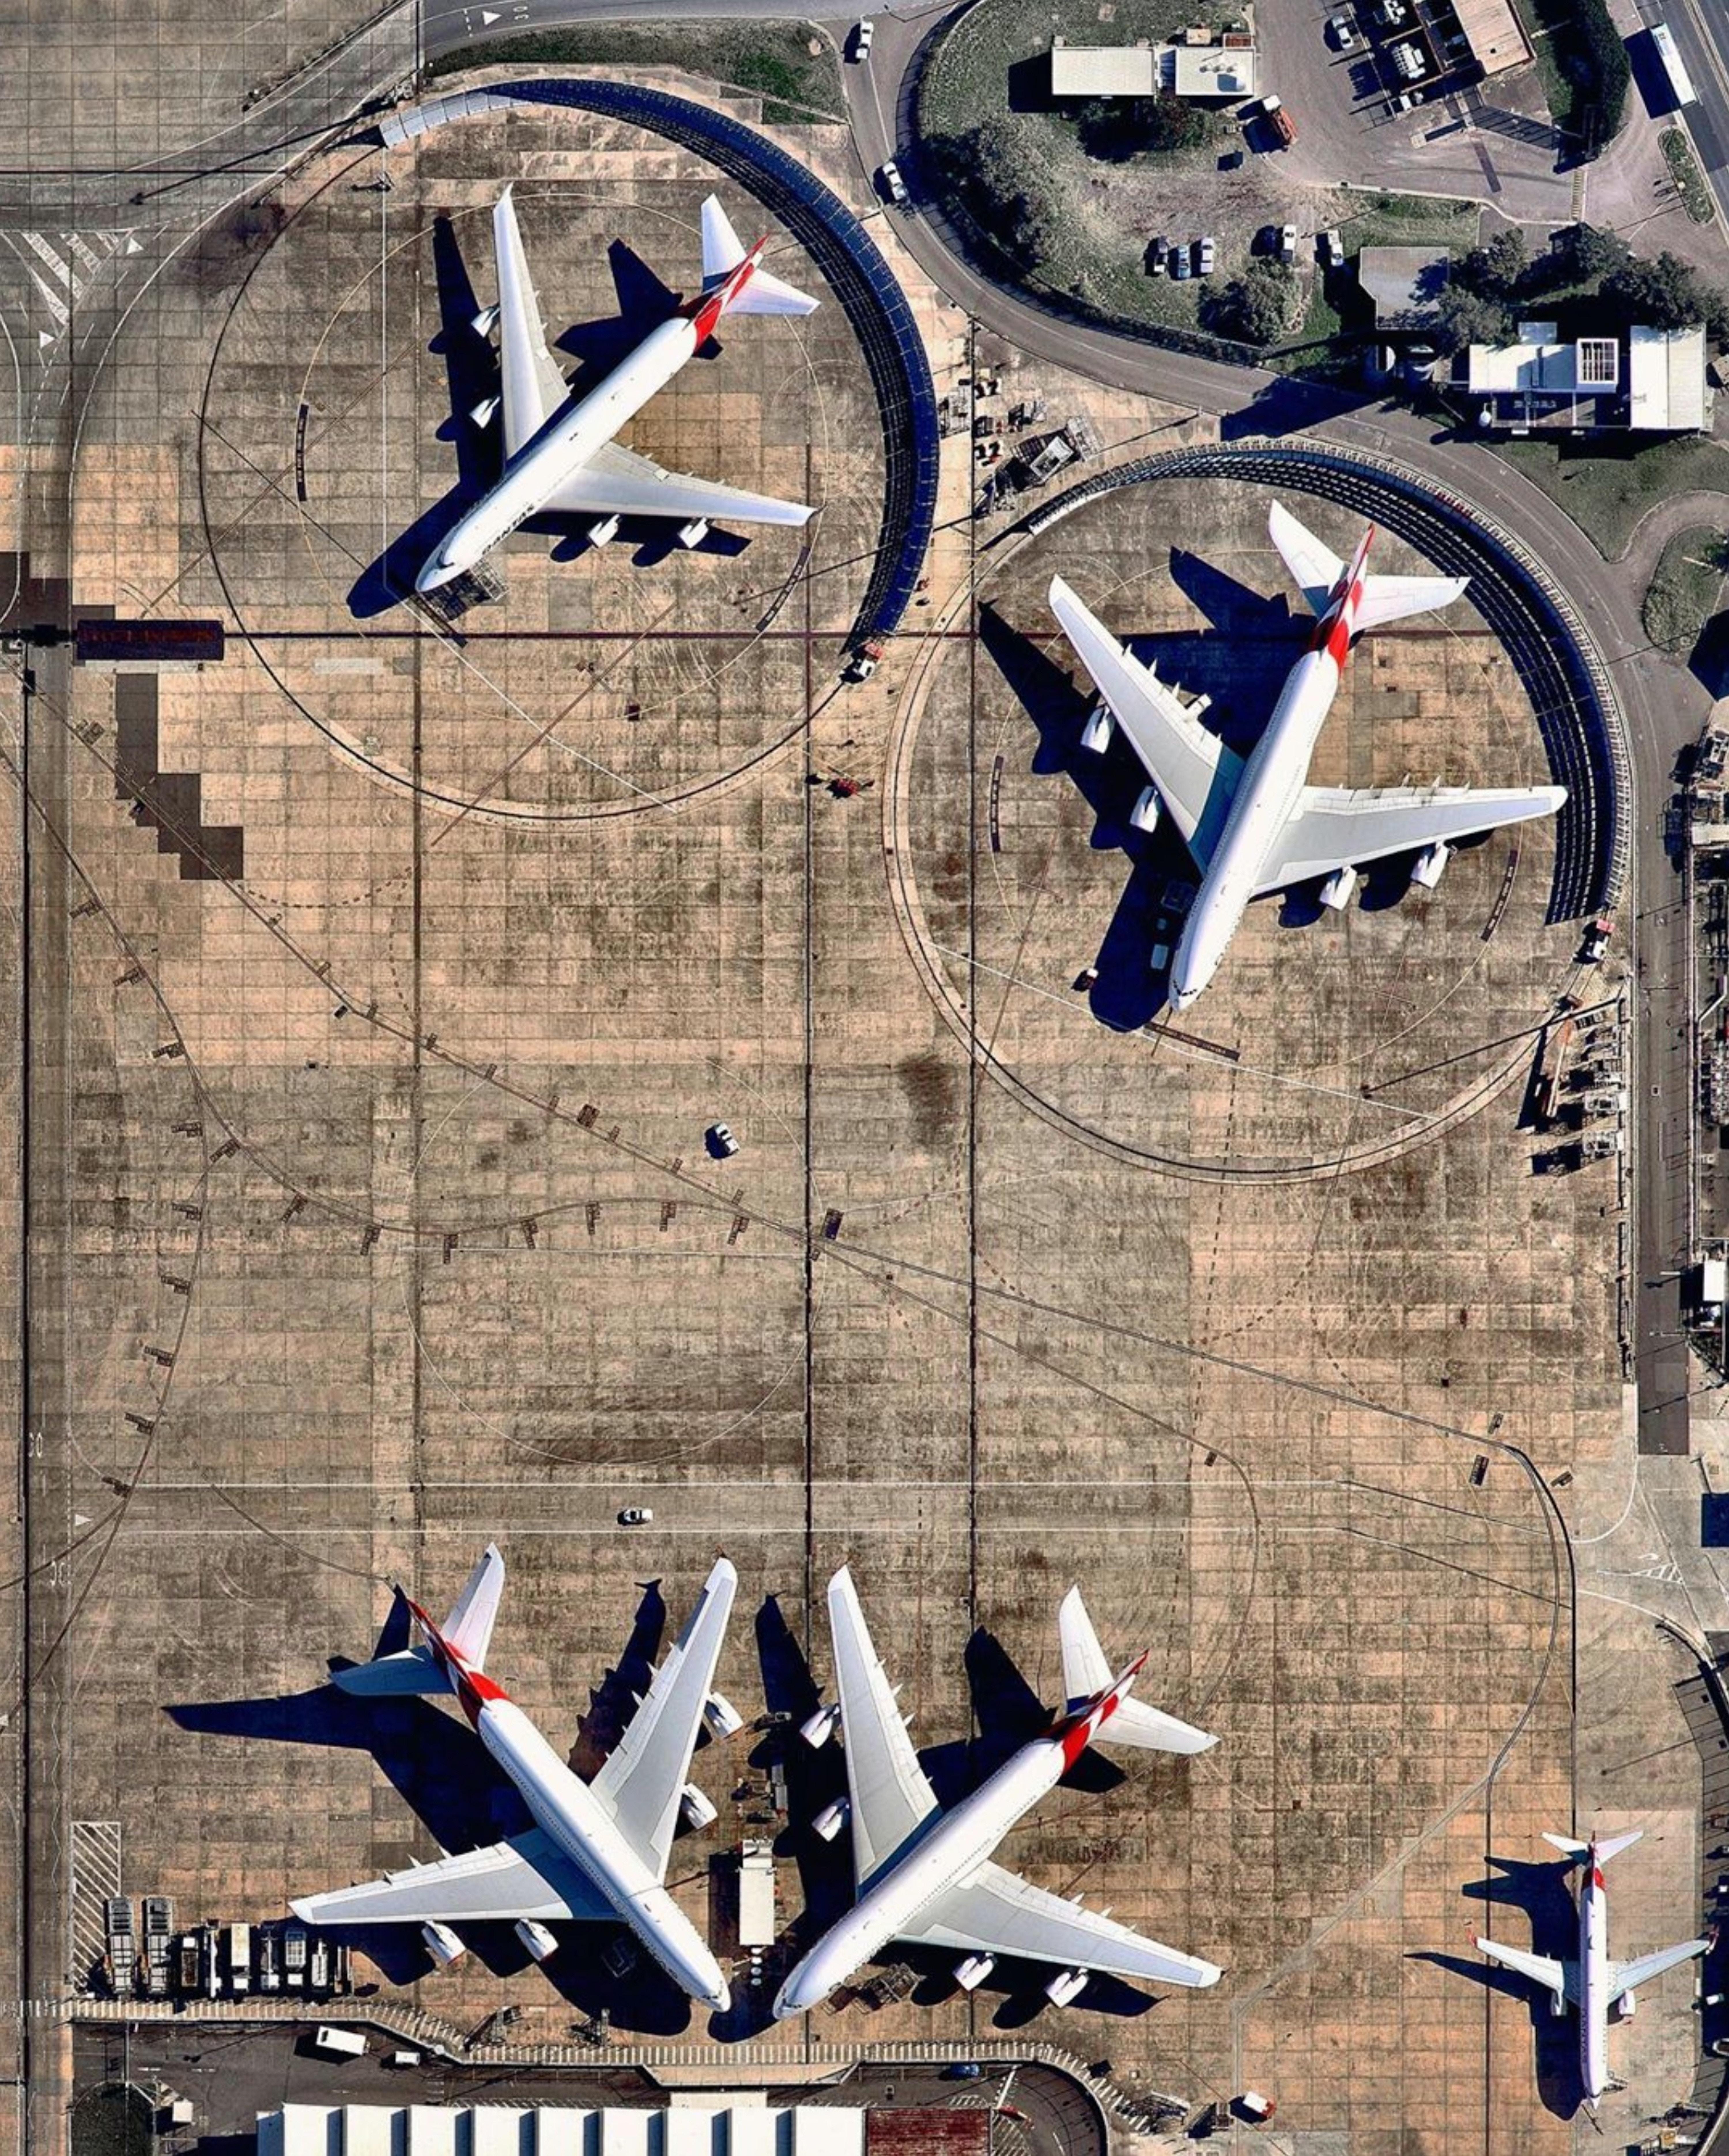 Sydney Airport Plane Maintenance